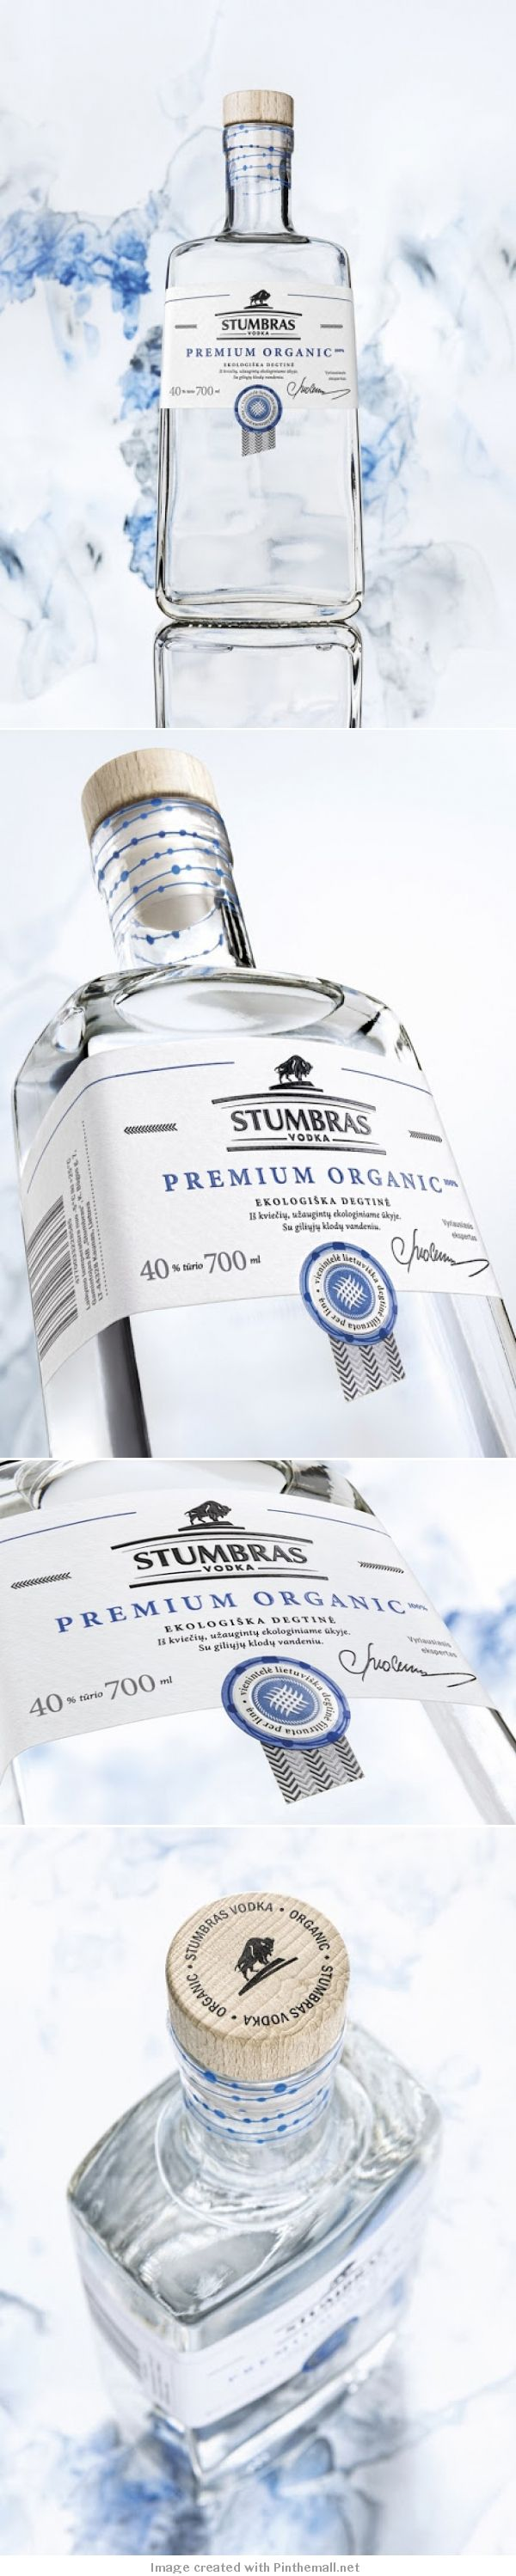 Stumbras Vodka Premium Organic Art direction, design: Edvardas Kavarskas Product development department manager: Jūratė Paulauskienė Product development manager: Artūras Kazlauskas Copywriter: Daiva Grikinienė Photographer: Edgaras Marozas Aquarelle